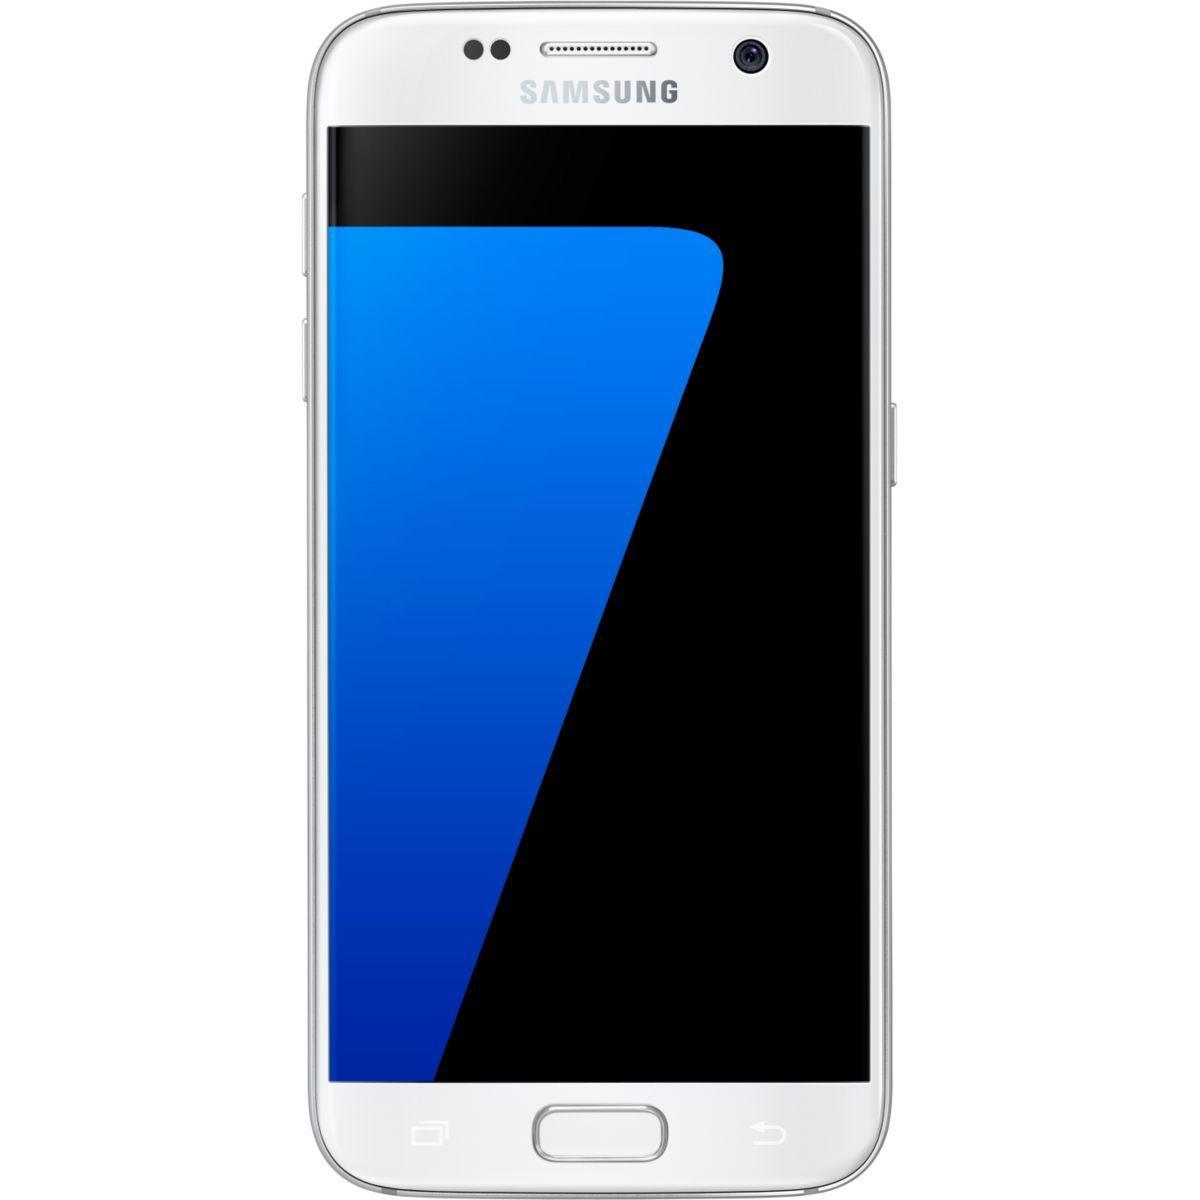 Pack promo smartphone samsung galaxy s7 32go blanc + etui samsung s view cover galaxy s7 silver - soldes et bonnes affaires à prix imbattables